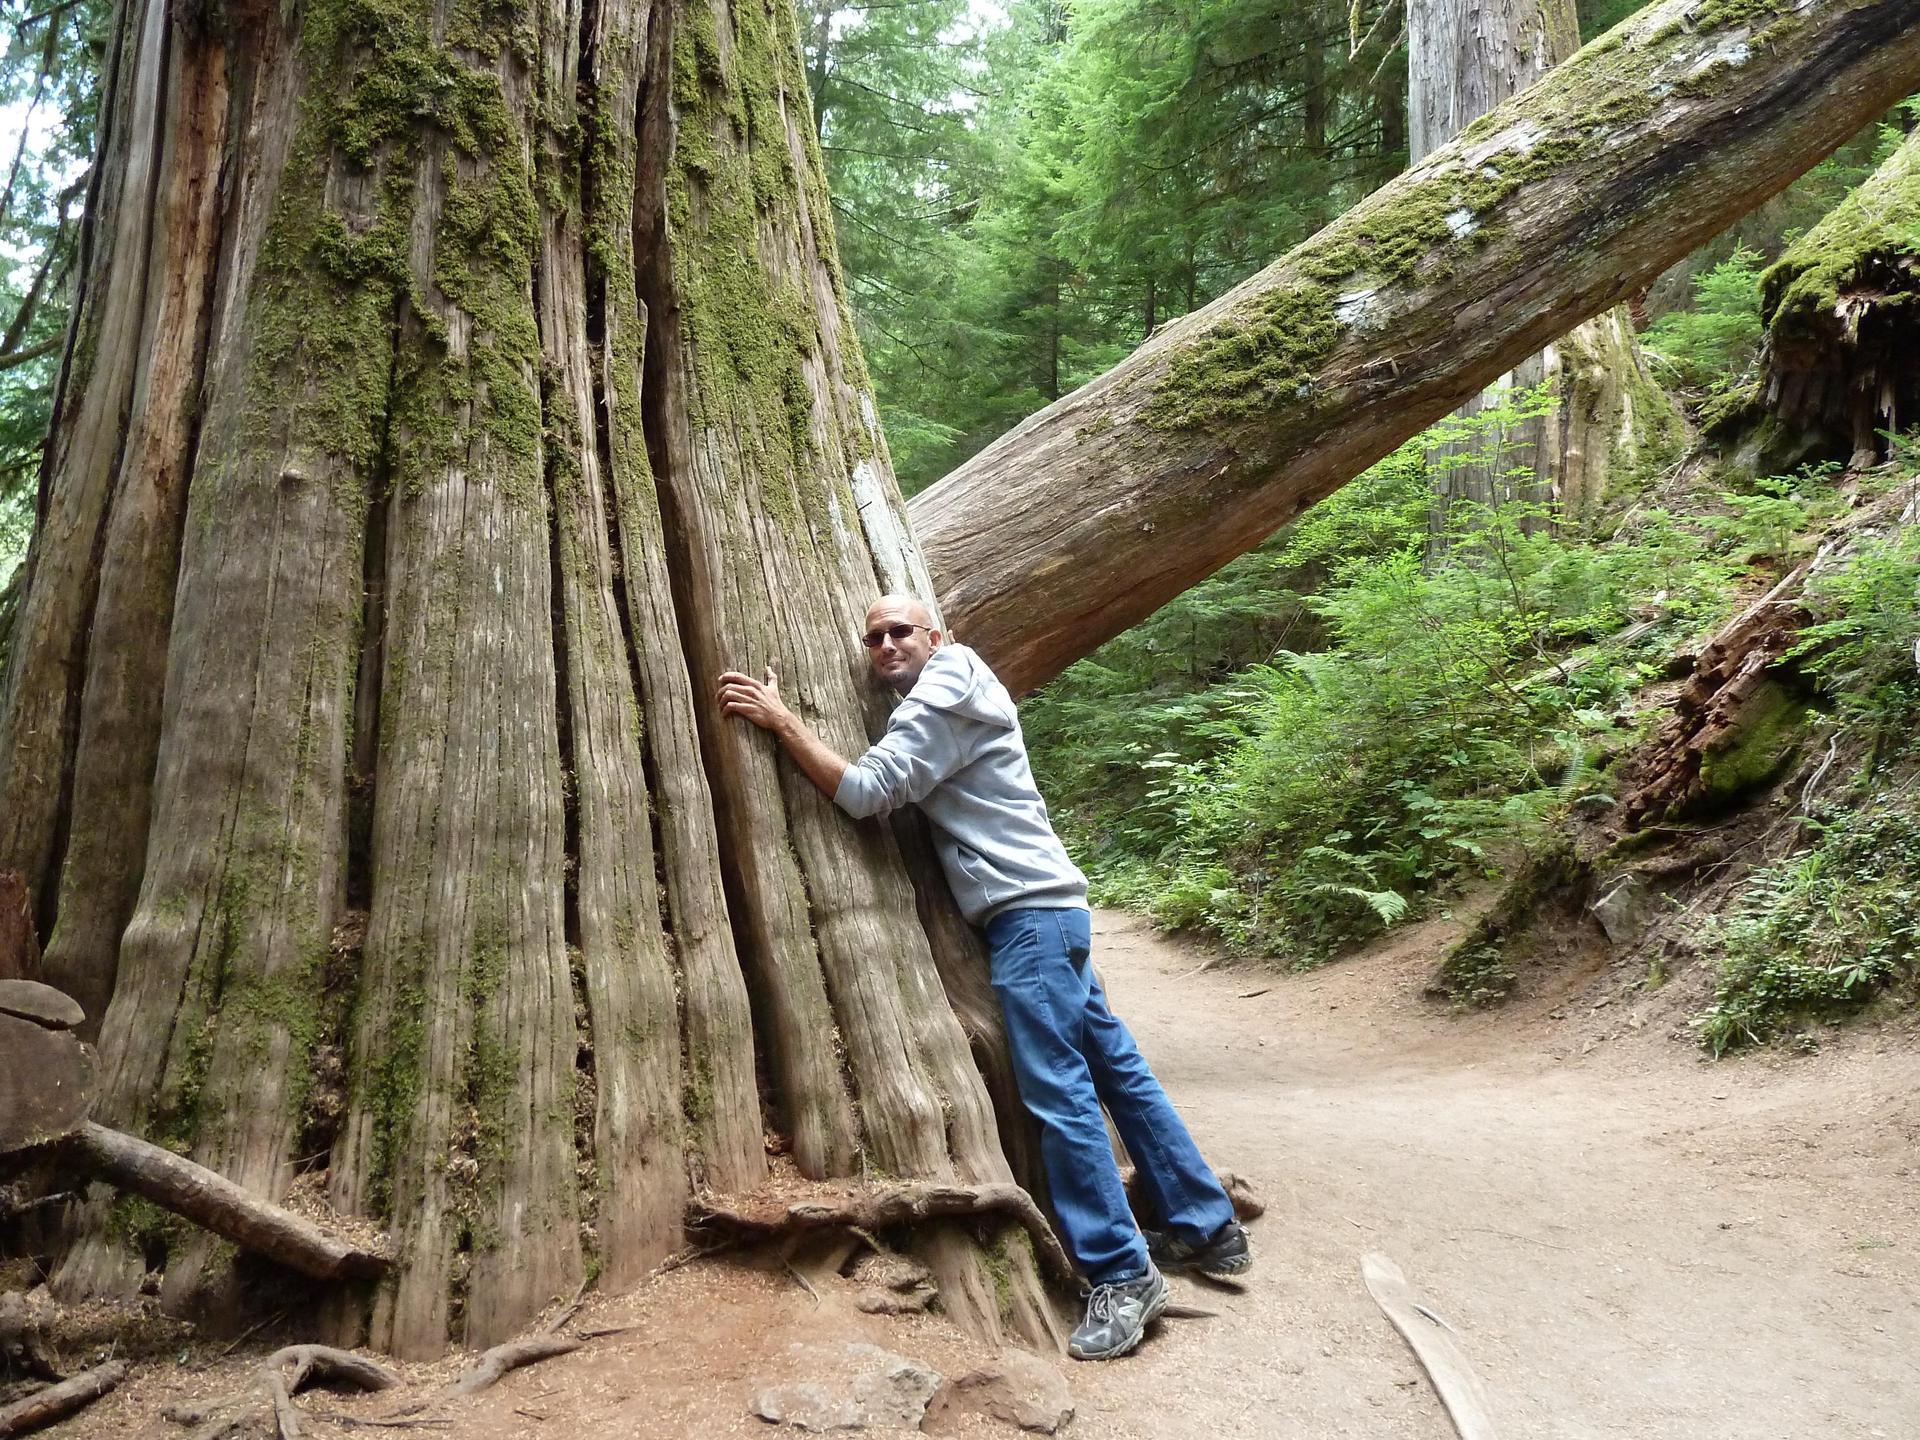 Man hugging tree